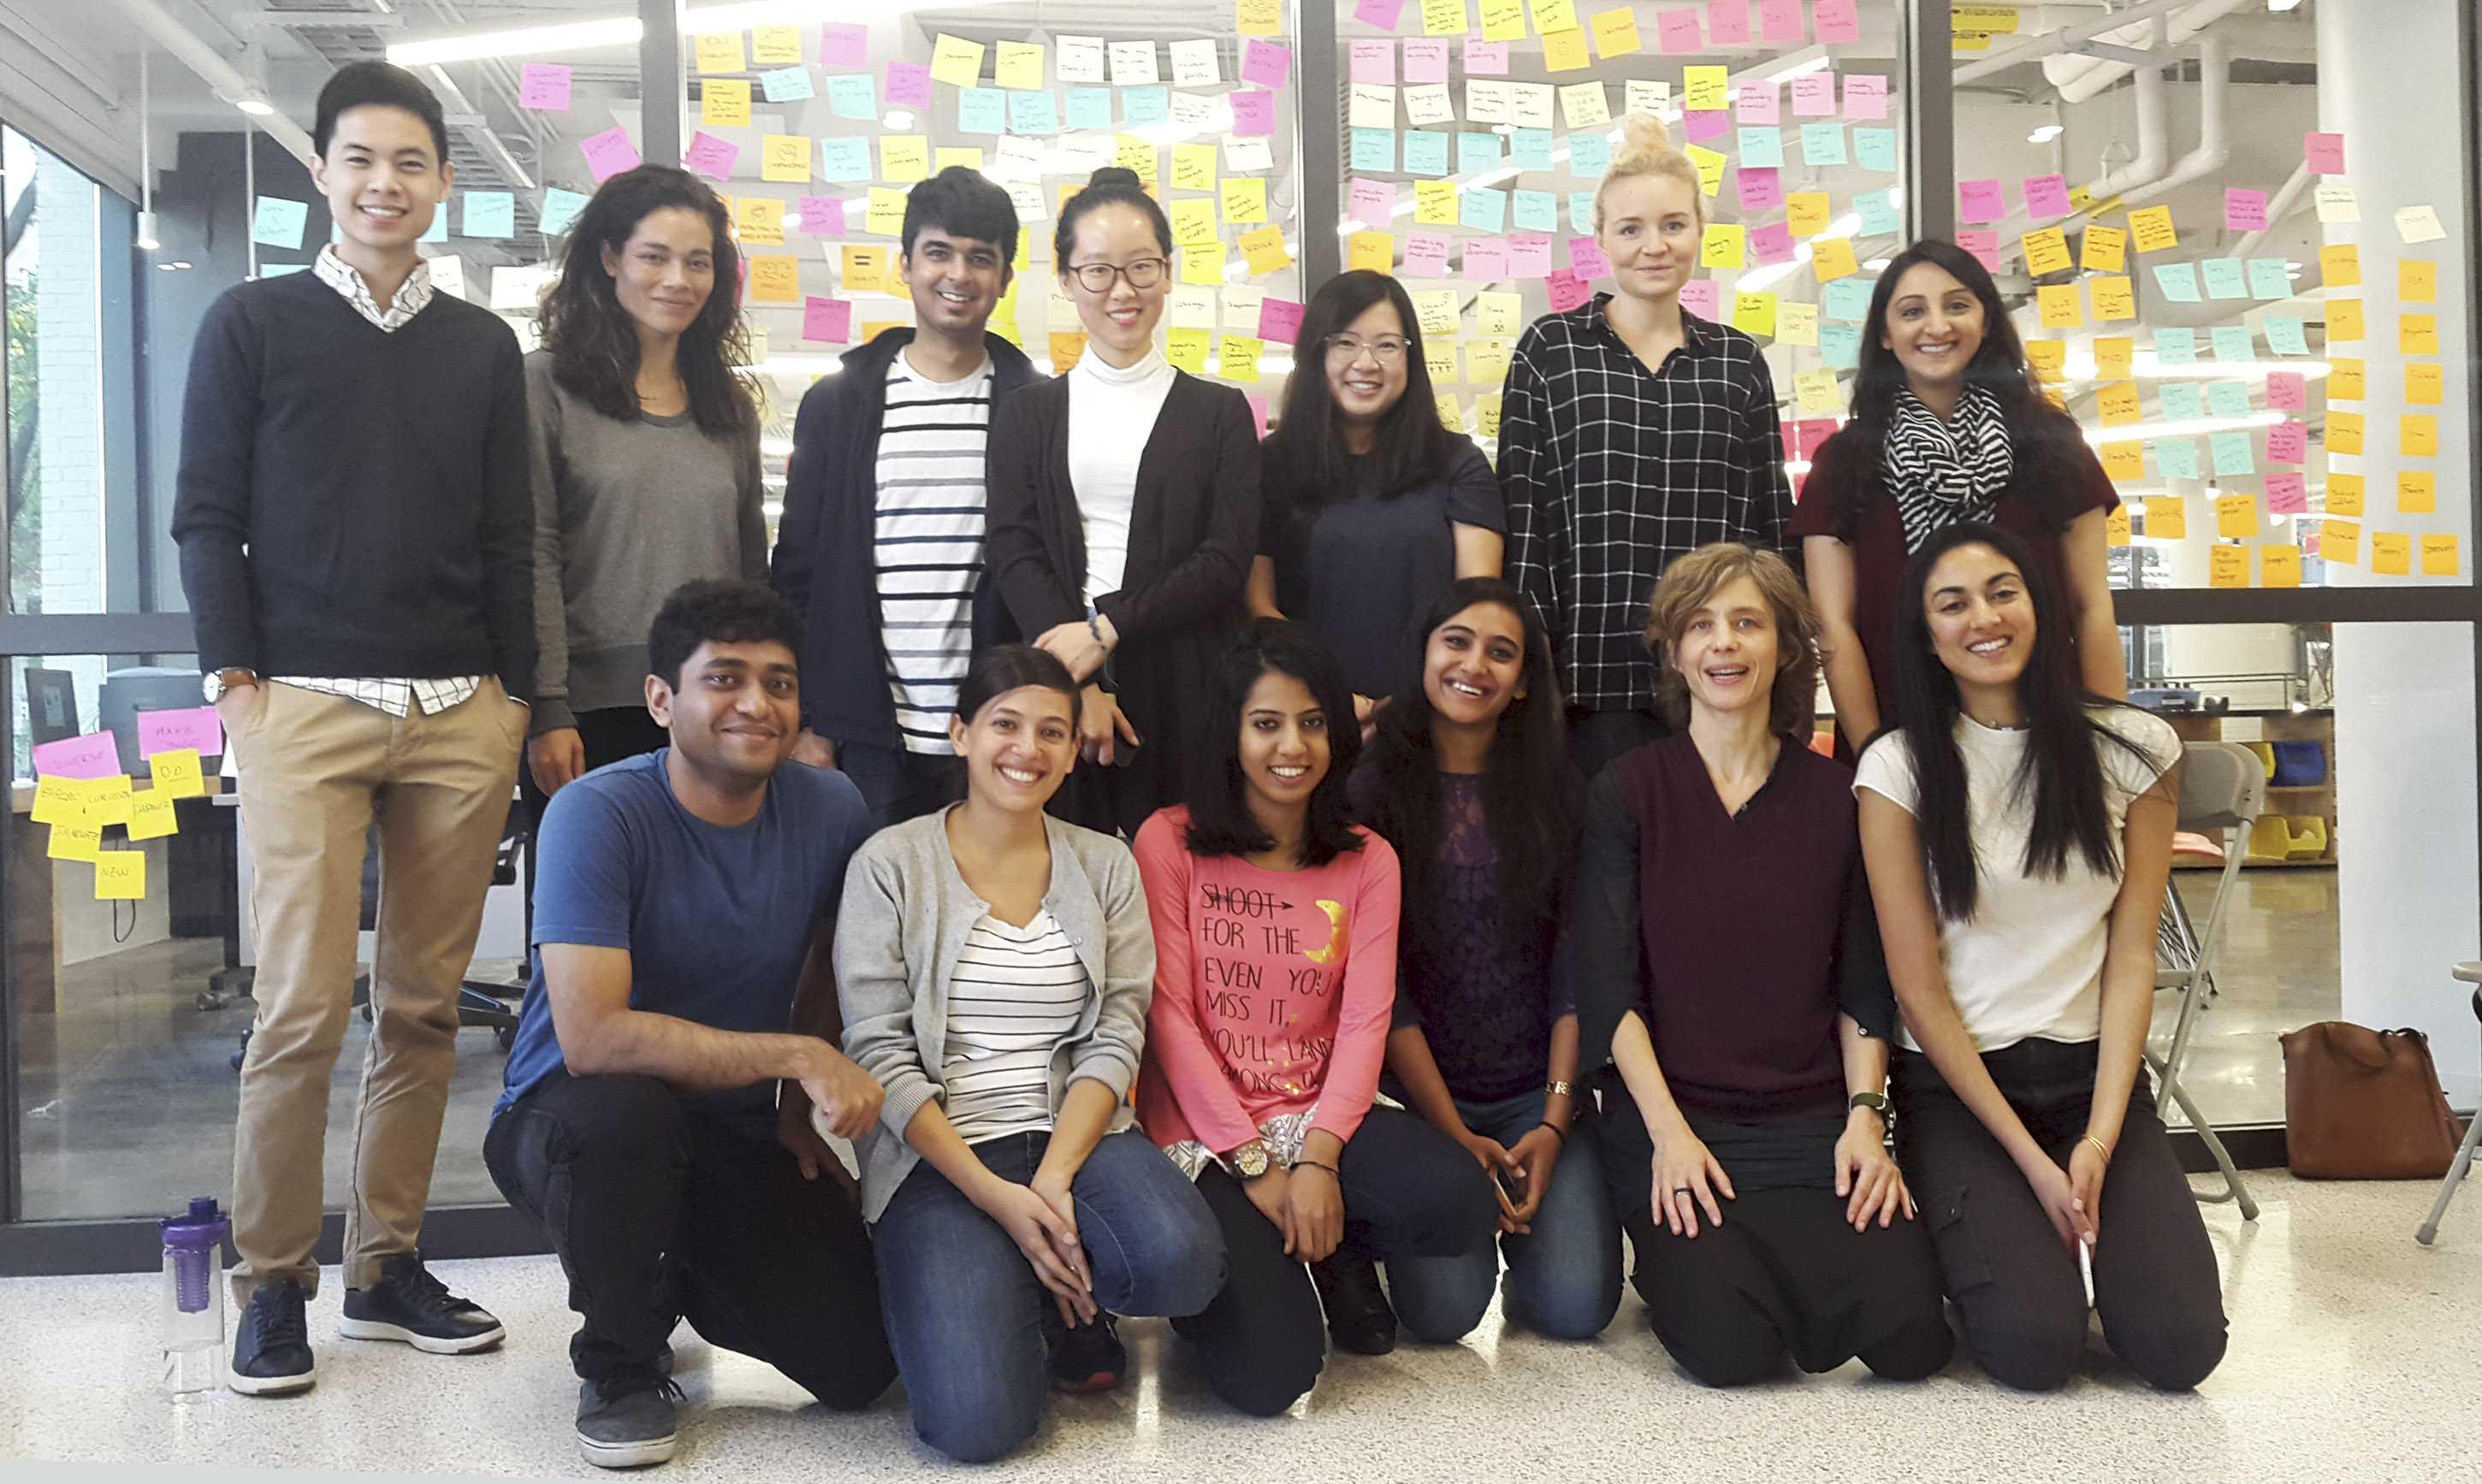 A Blueprint for Hope: Design for America NYU | Washington